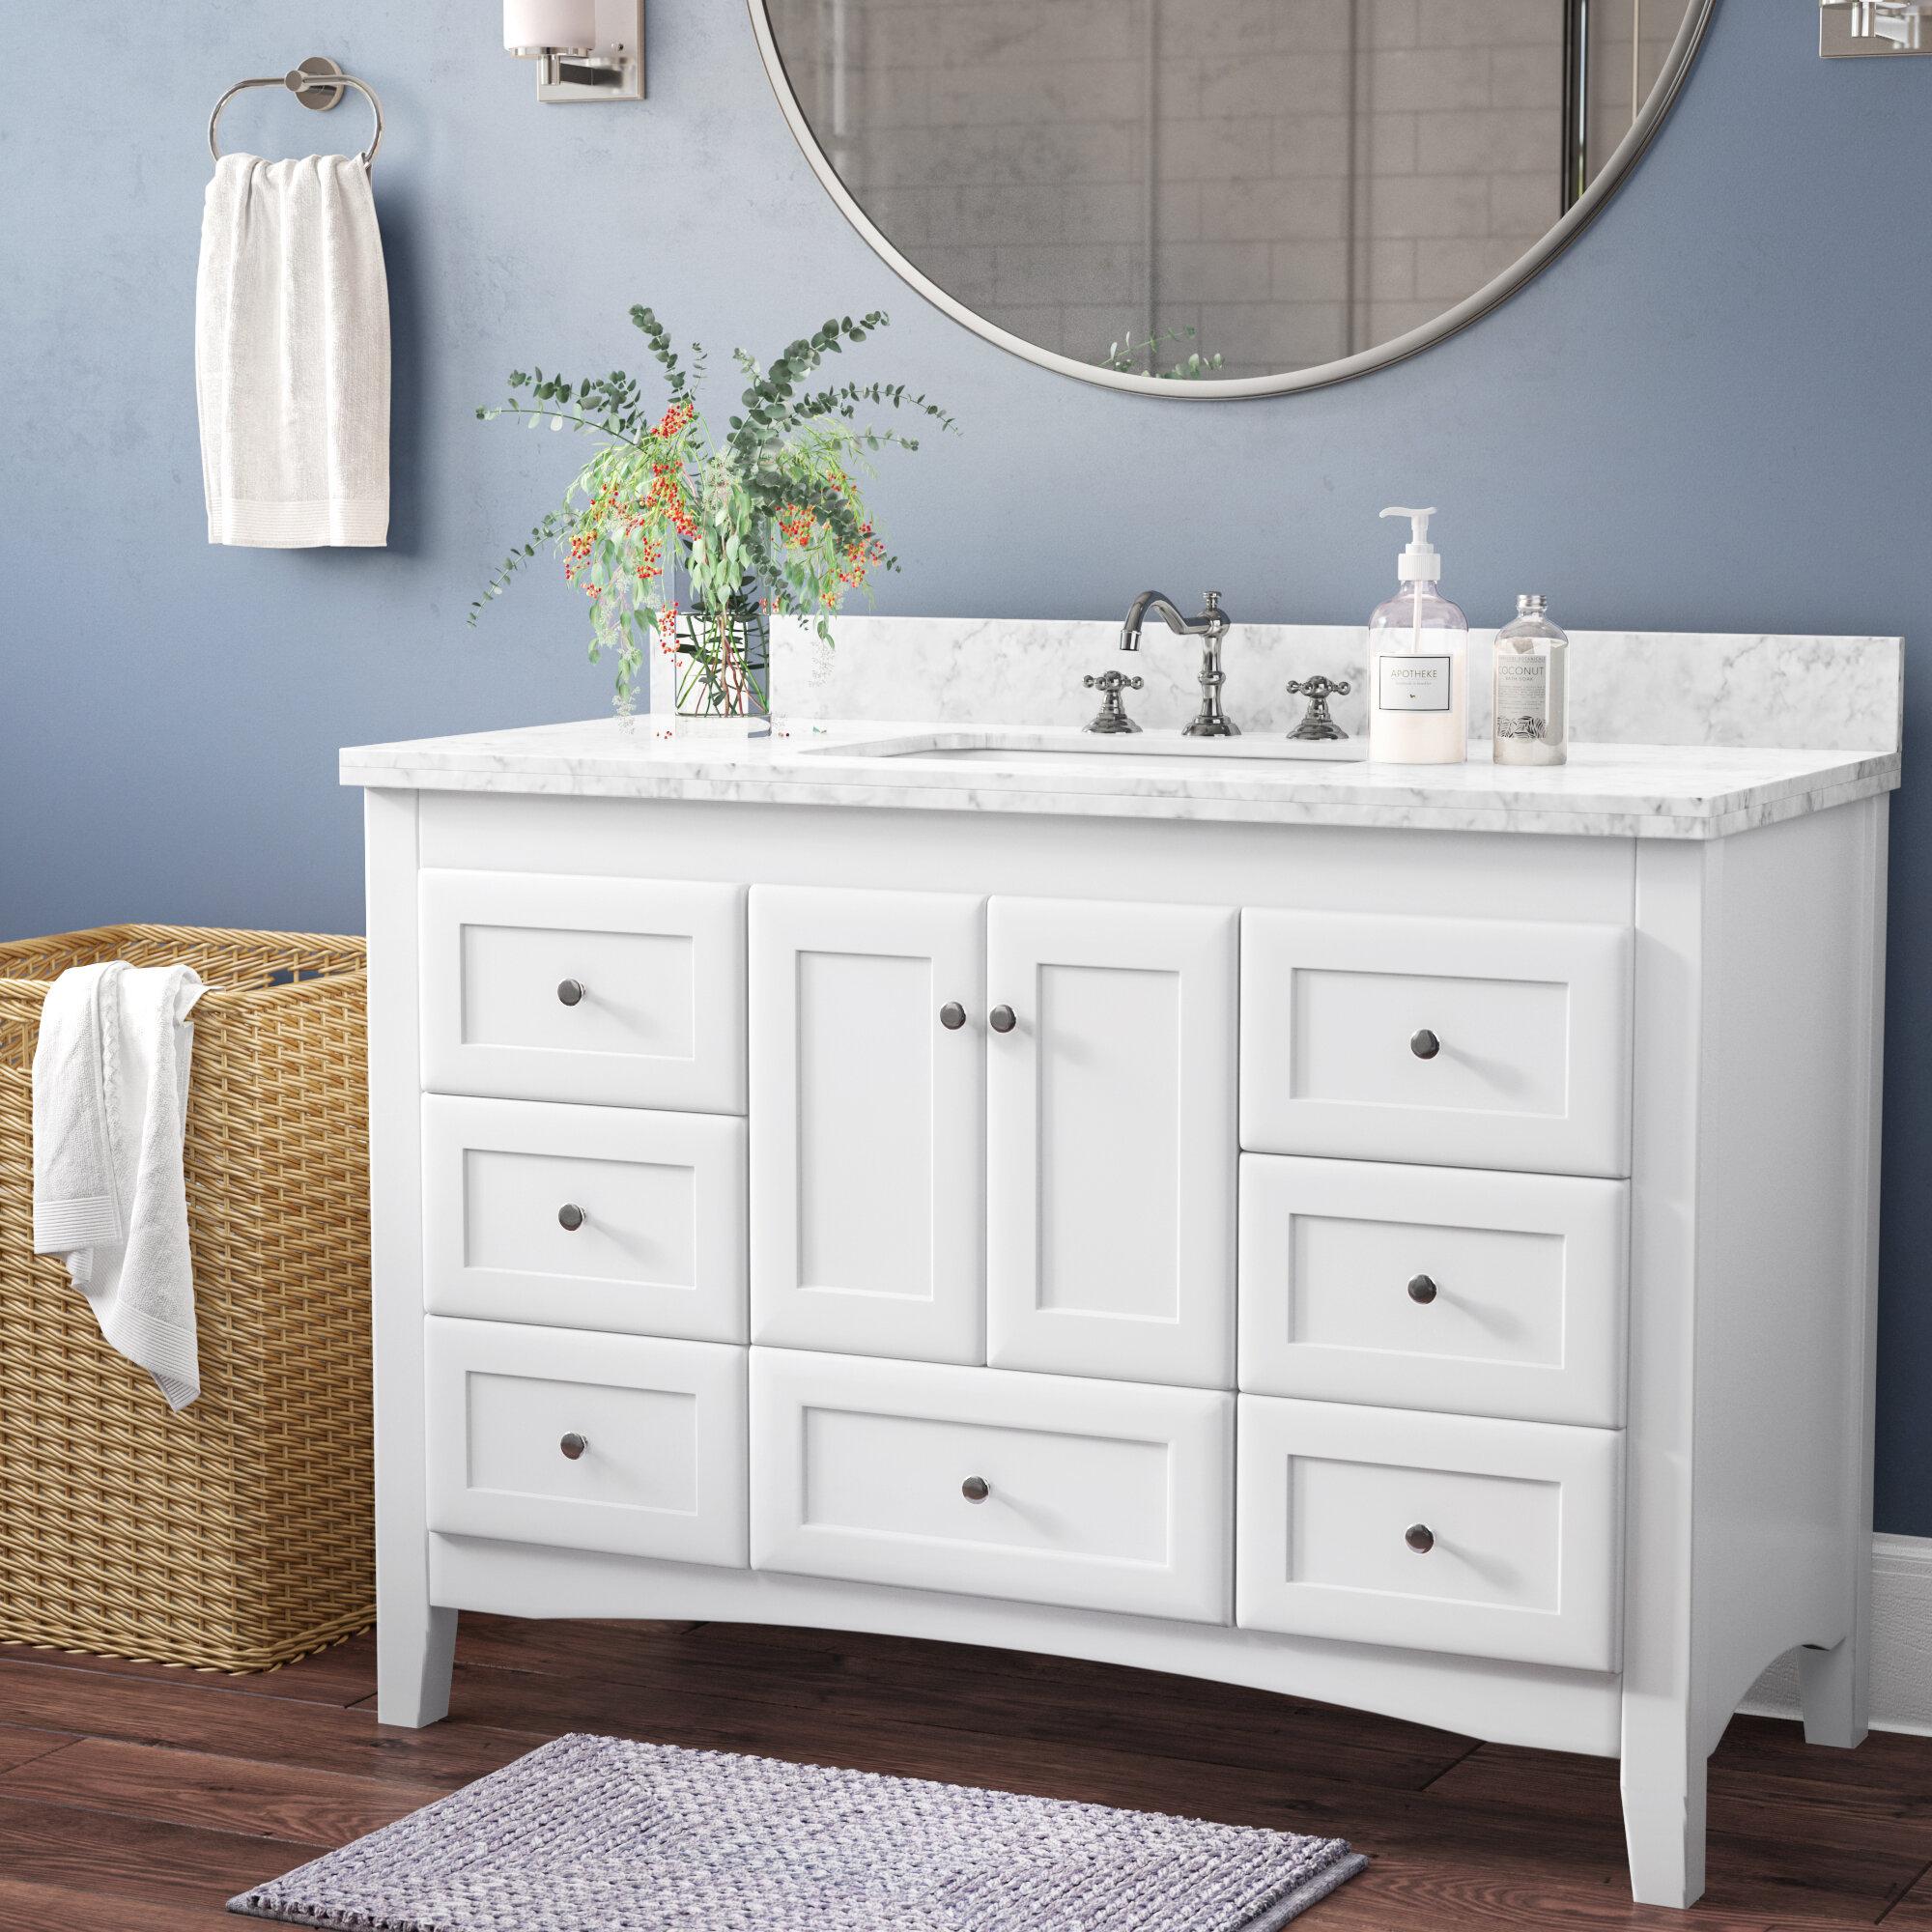 Prentice 48 Single Bathroom Vanity Set Reviews Birch Lane